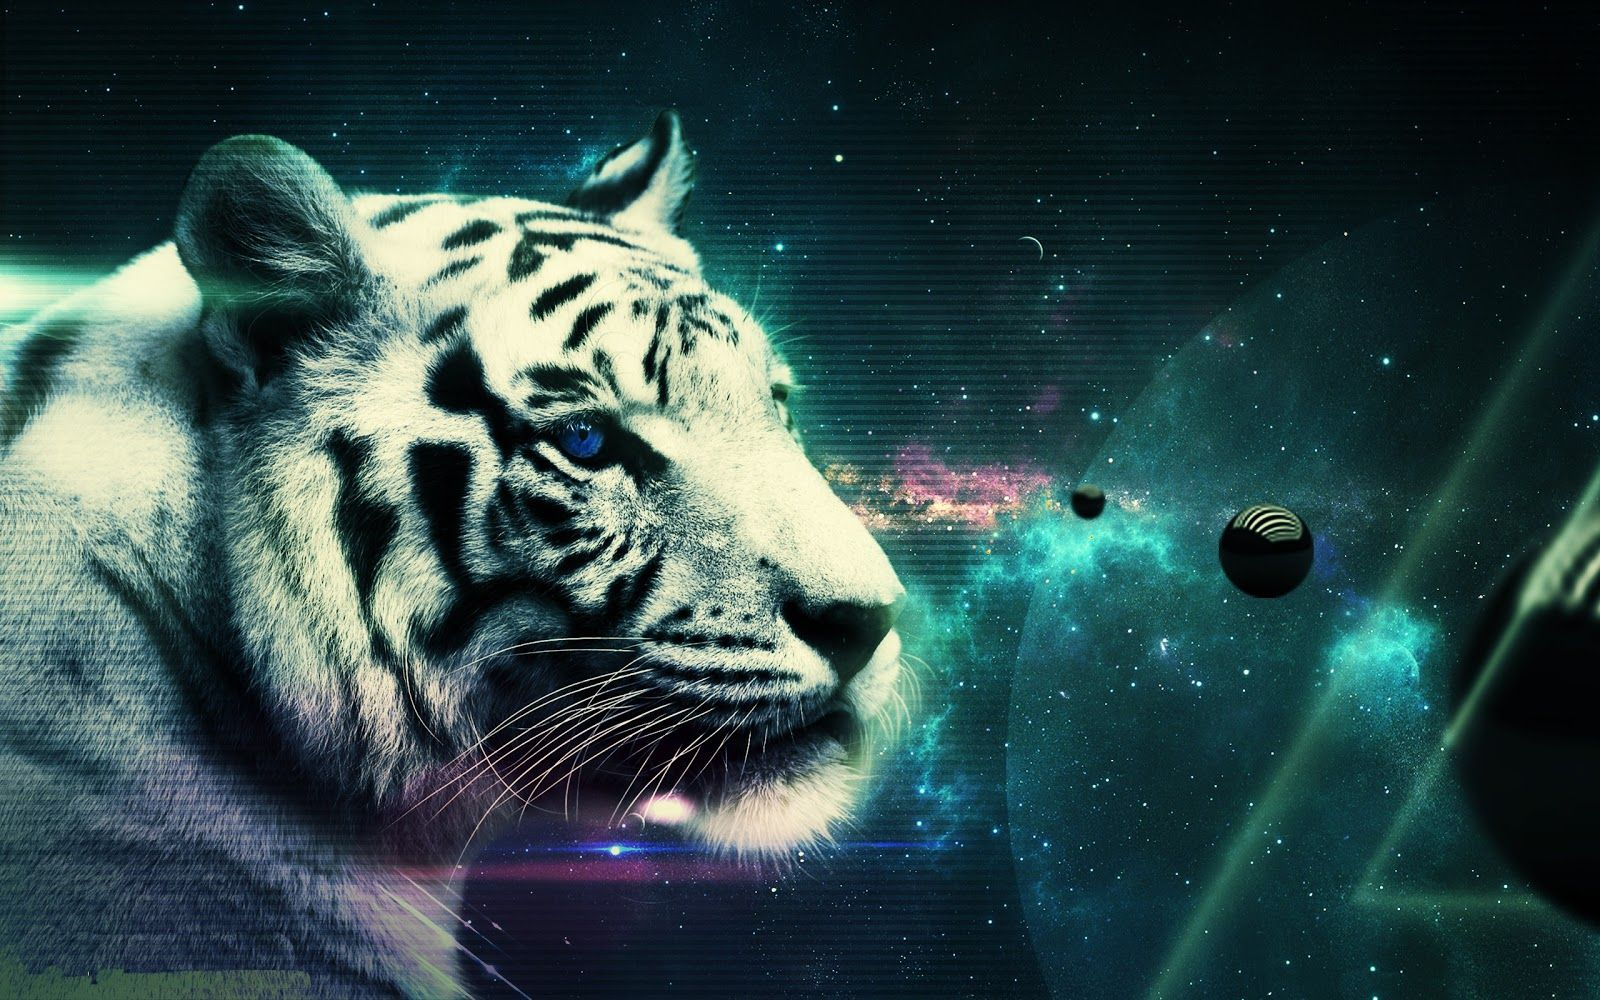 White Tiger Beautiful Tiger Hd Tiger Images Sleeping Tiger High Tiger Wallpaper Animal Wallpaper Tiger Pictures